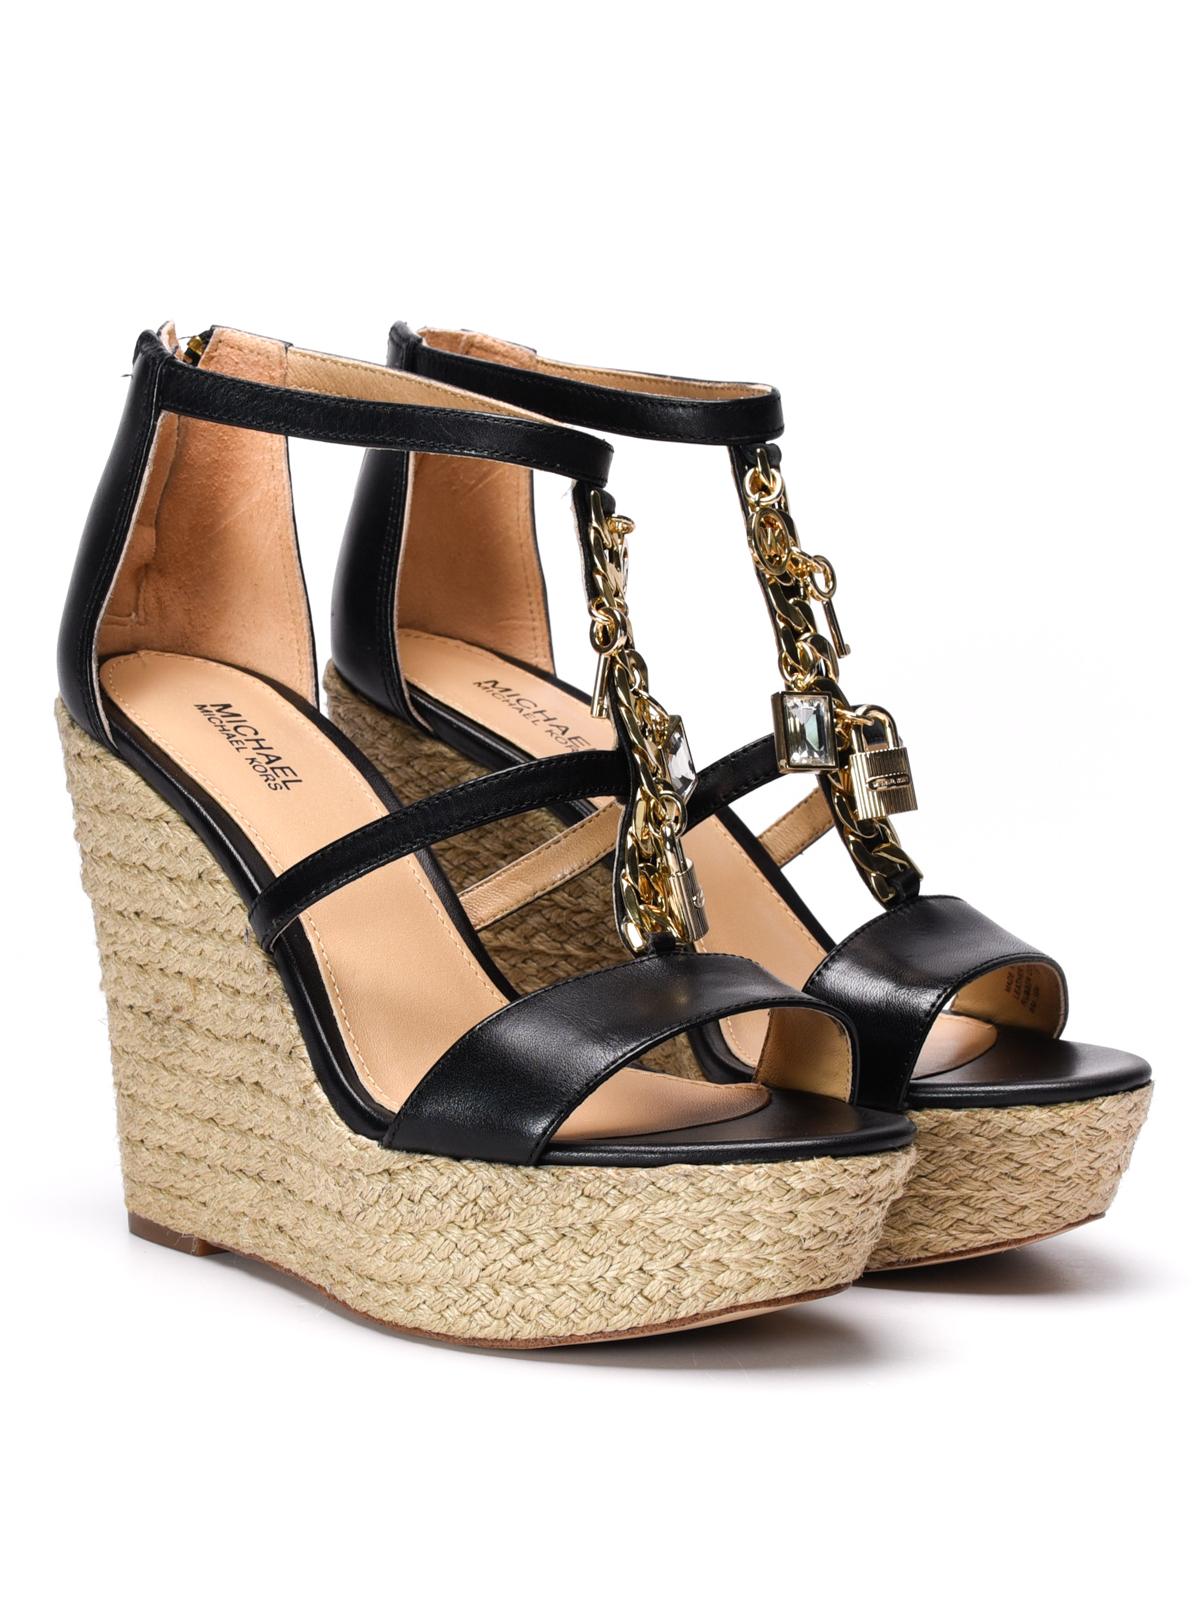 Lyst - Michael Kors Michael Guiliana Flat Sandals in Brown